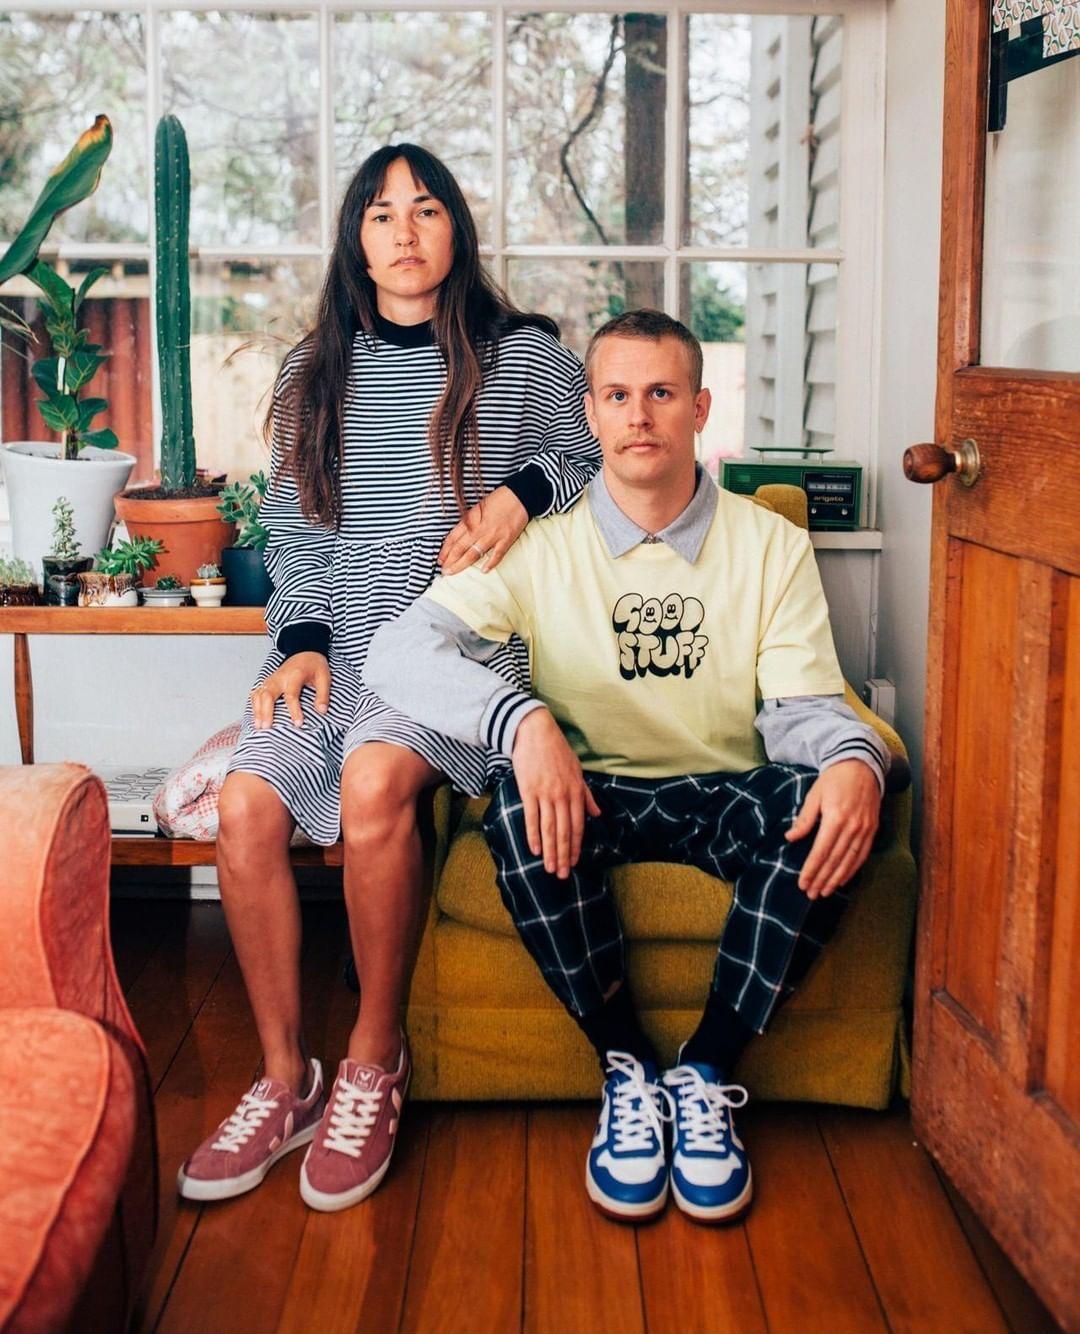 b997a53be9a1 Family portrait with our V-10 B-mesh White Indigo and Esplar Suede Dried